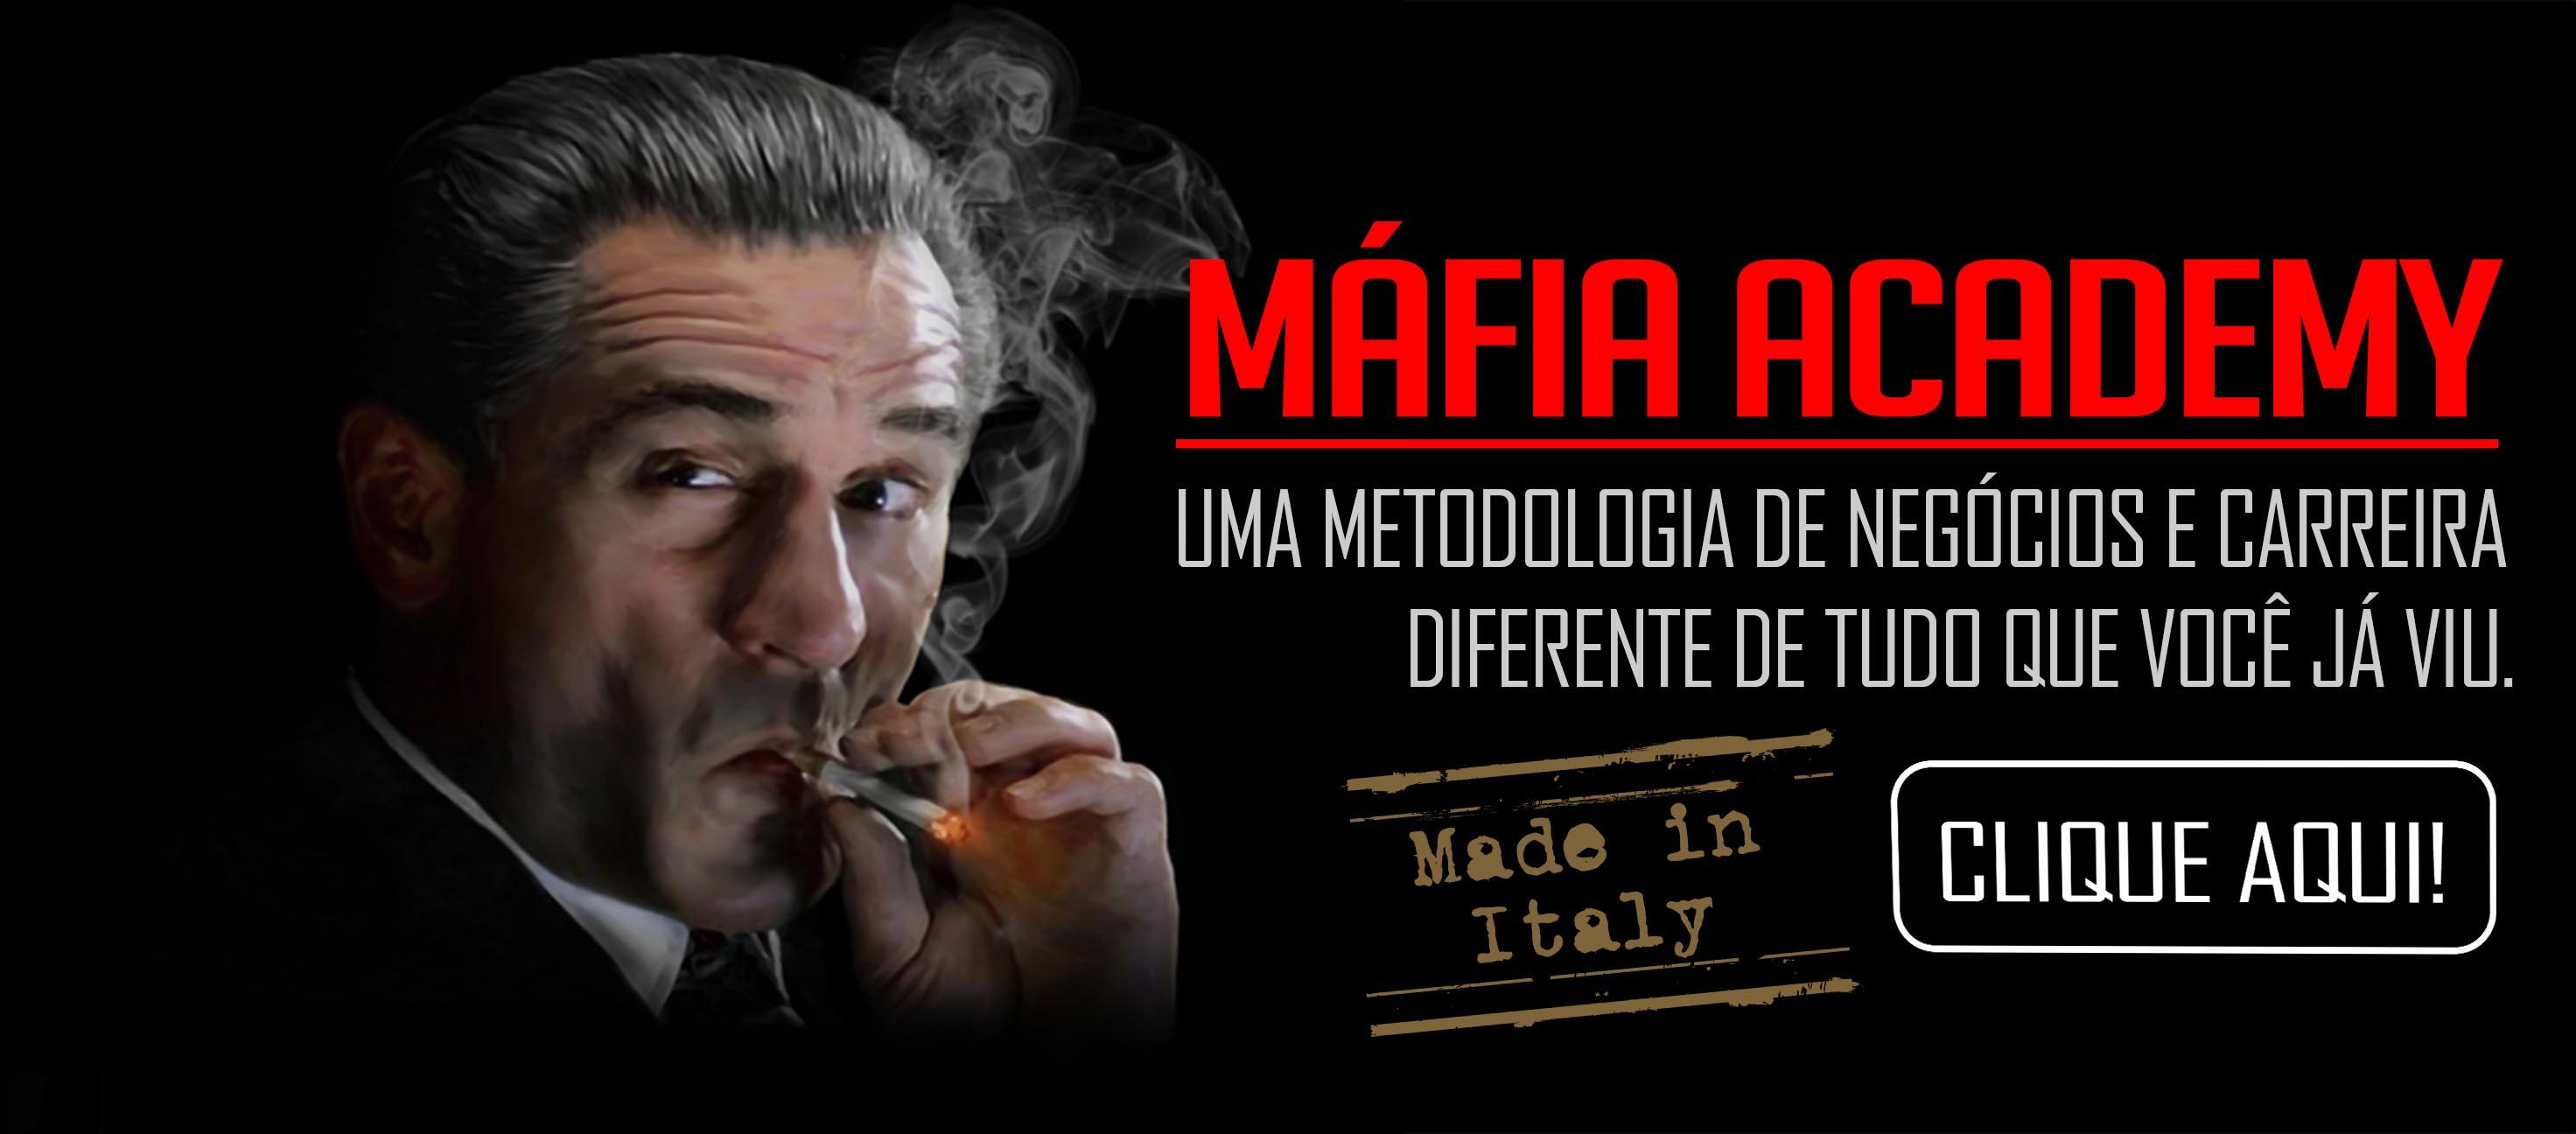 Banner rodape mafia-academy